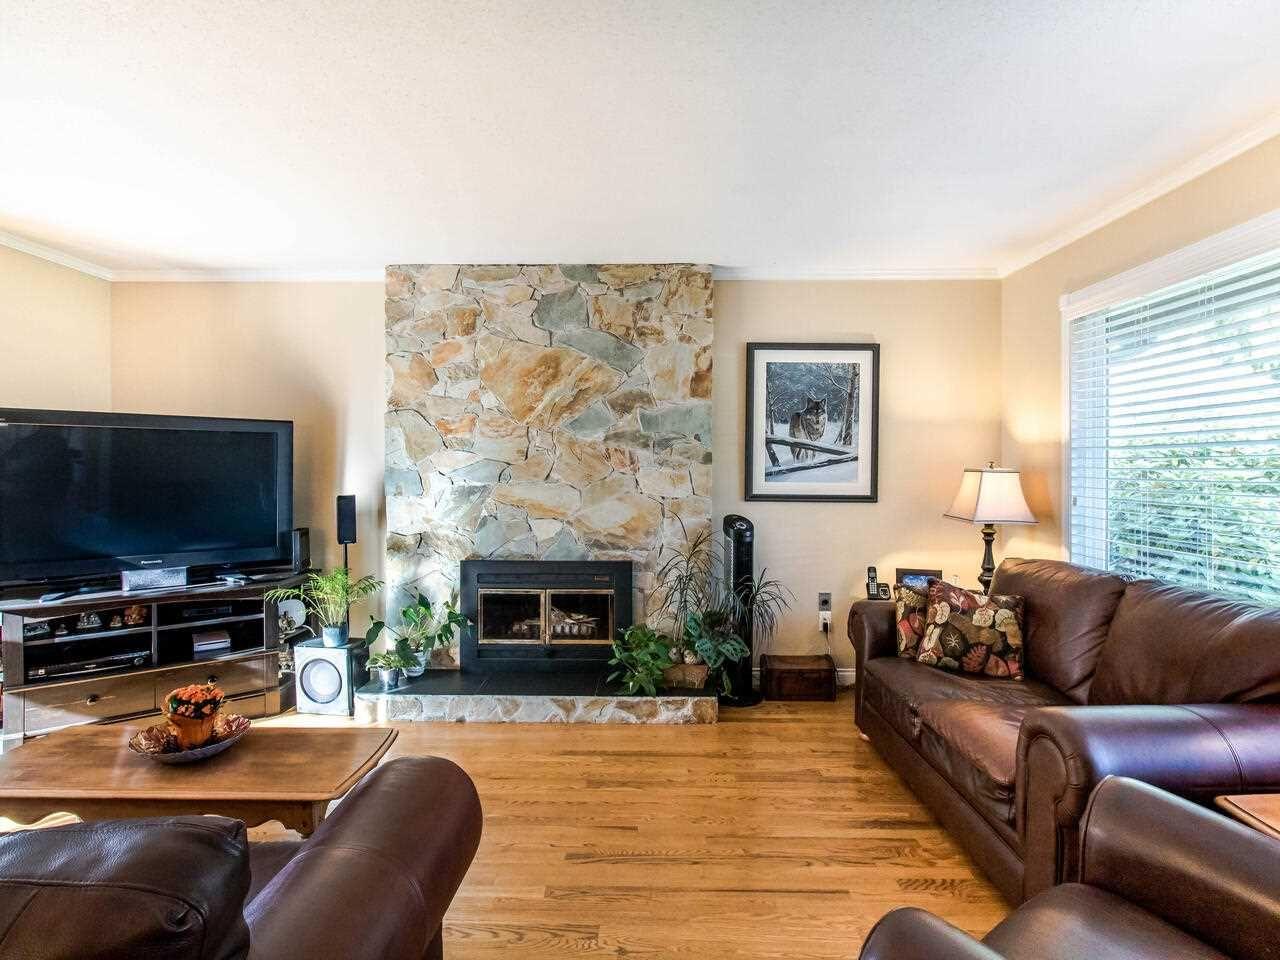 Photo 6: Photos: 11505 PEMBERTON Crescent in Delta: Annieville House for sale (N. Delta)  : MLS®# R2512135